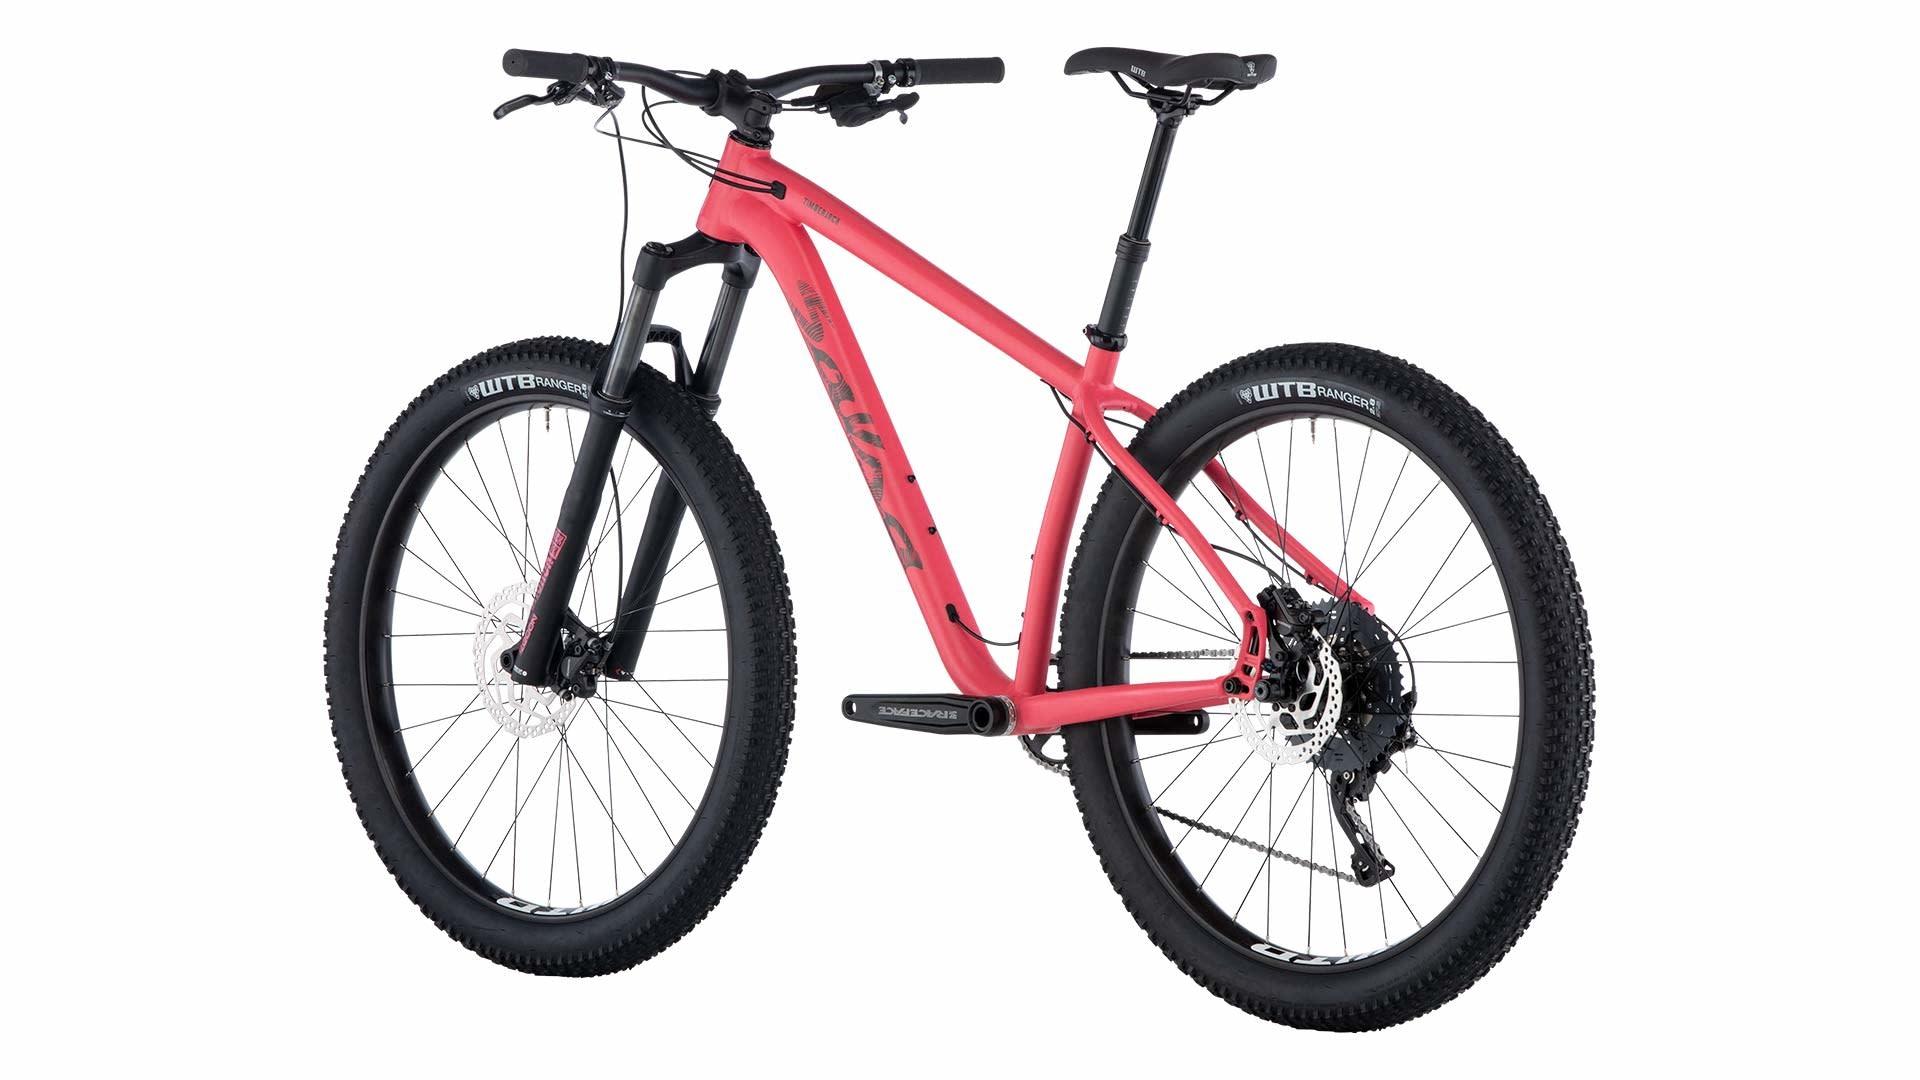 Salsa Salsa Timberjack SLX 27.5+ Bike Dark Green 2019